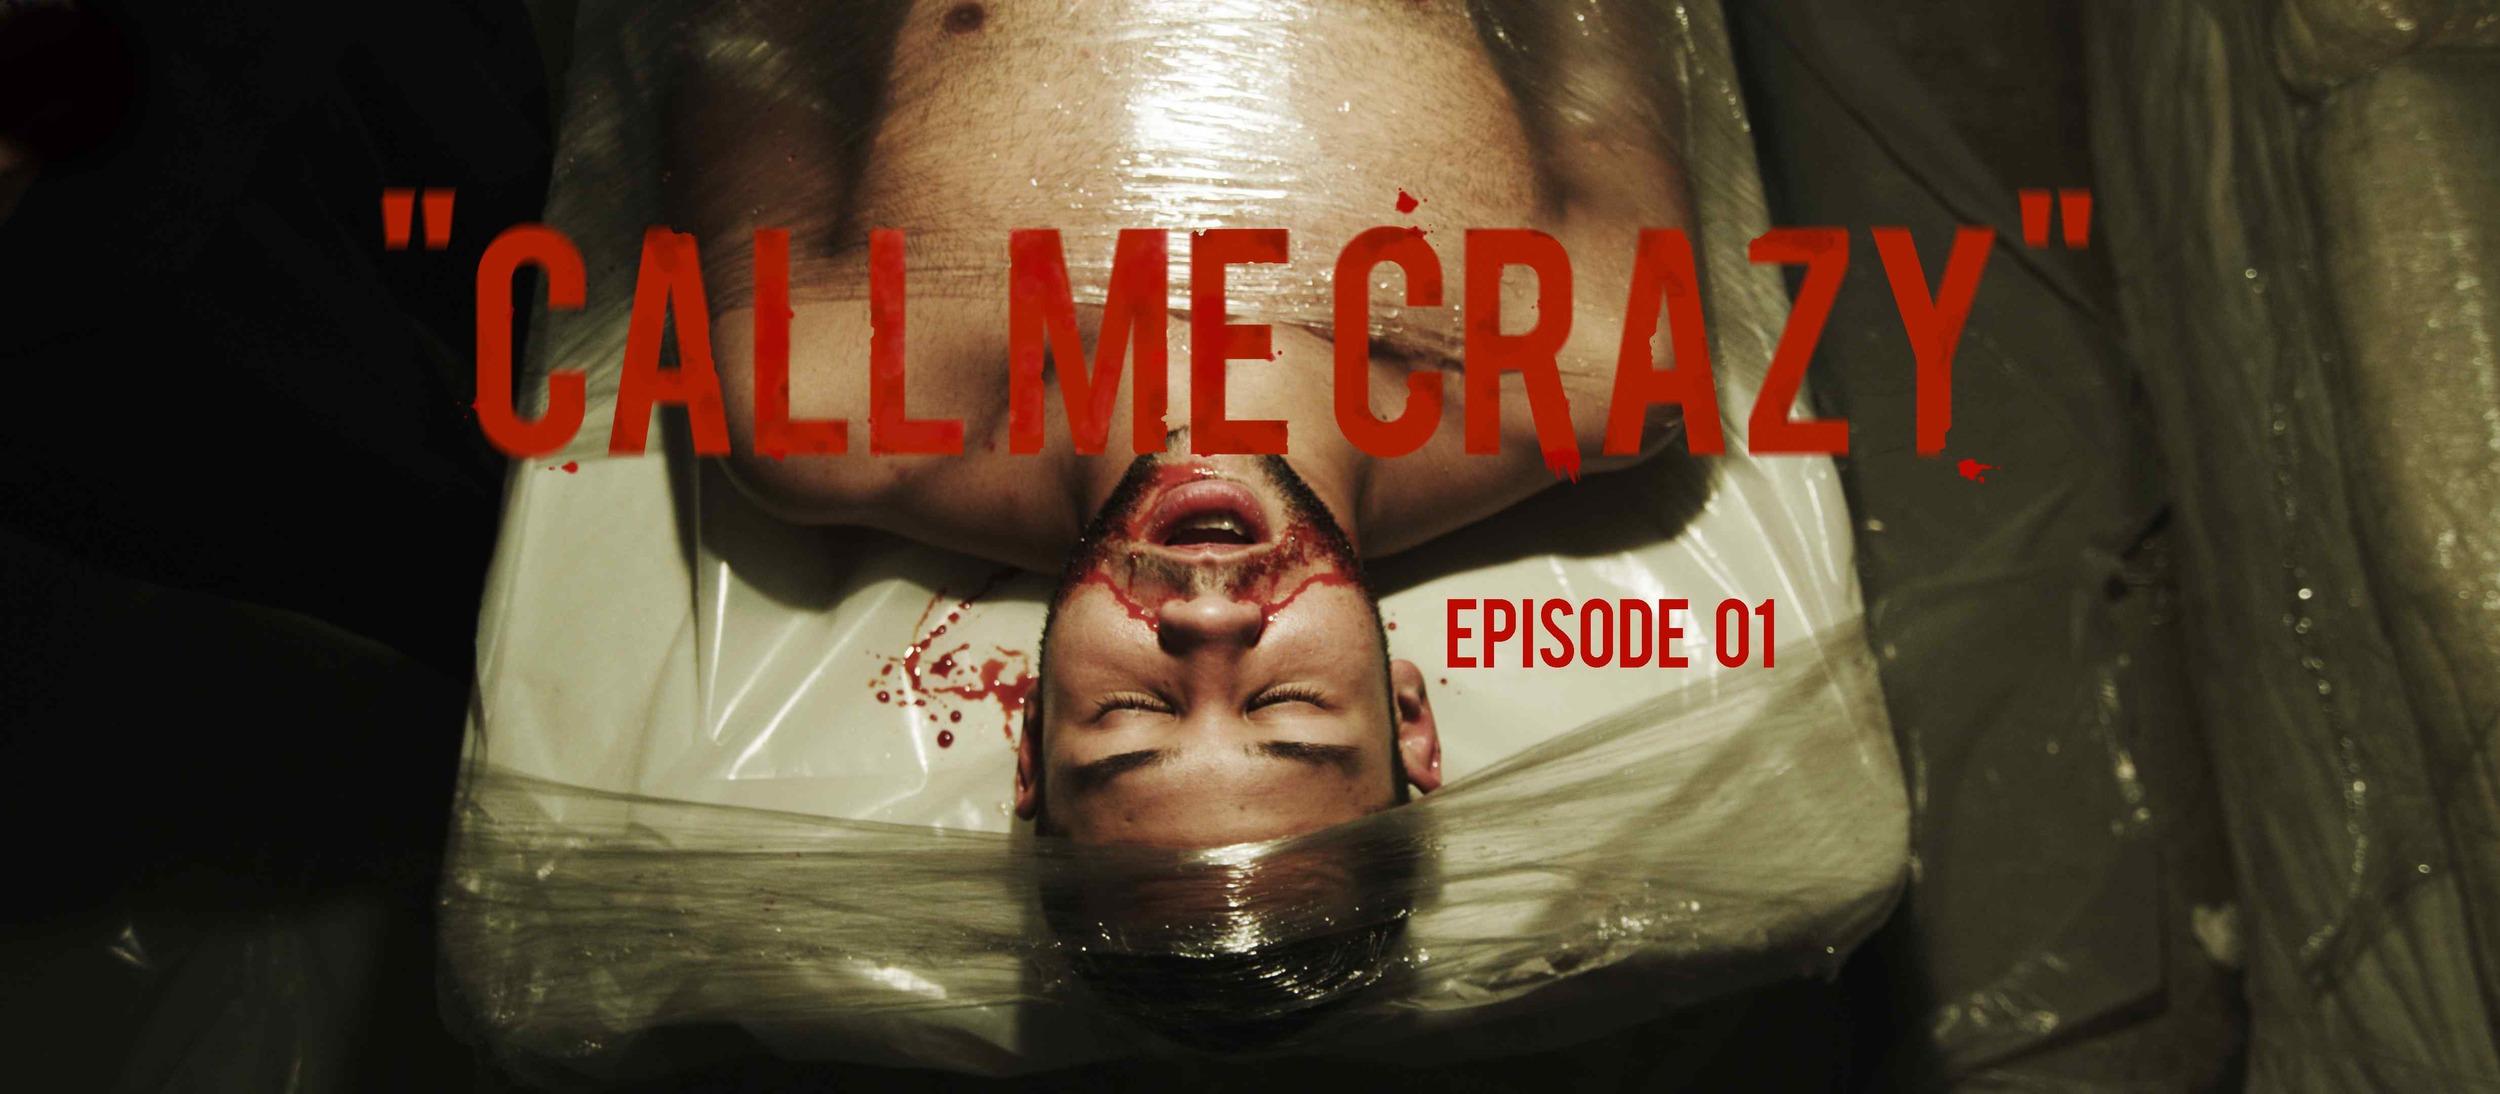 Call Me Crazy Teaser4blog.jpg